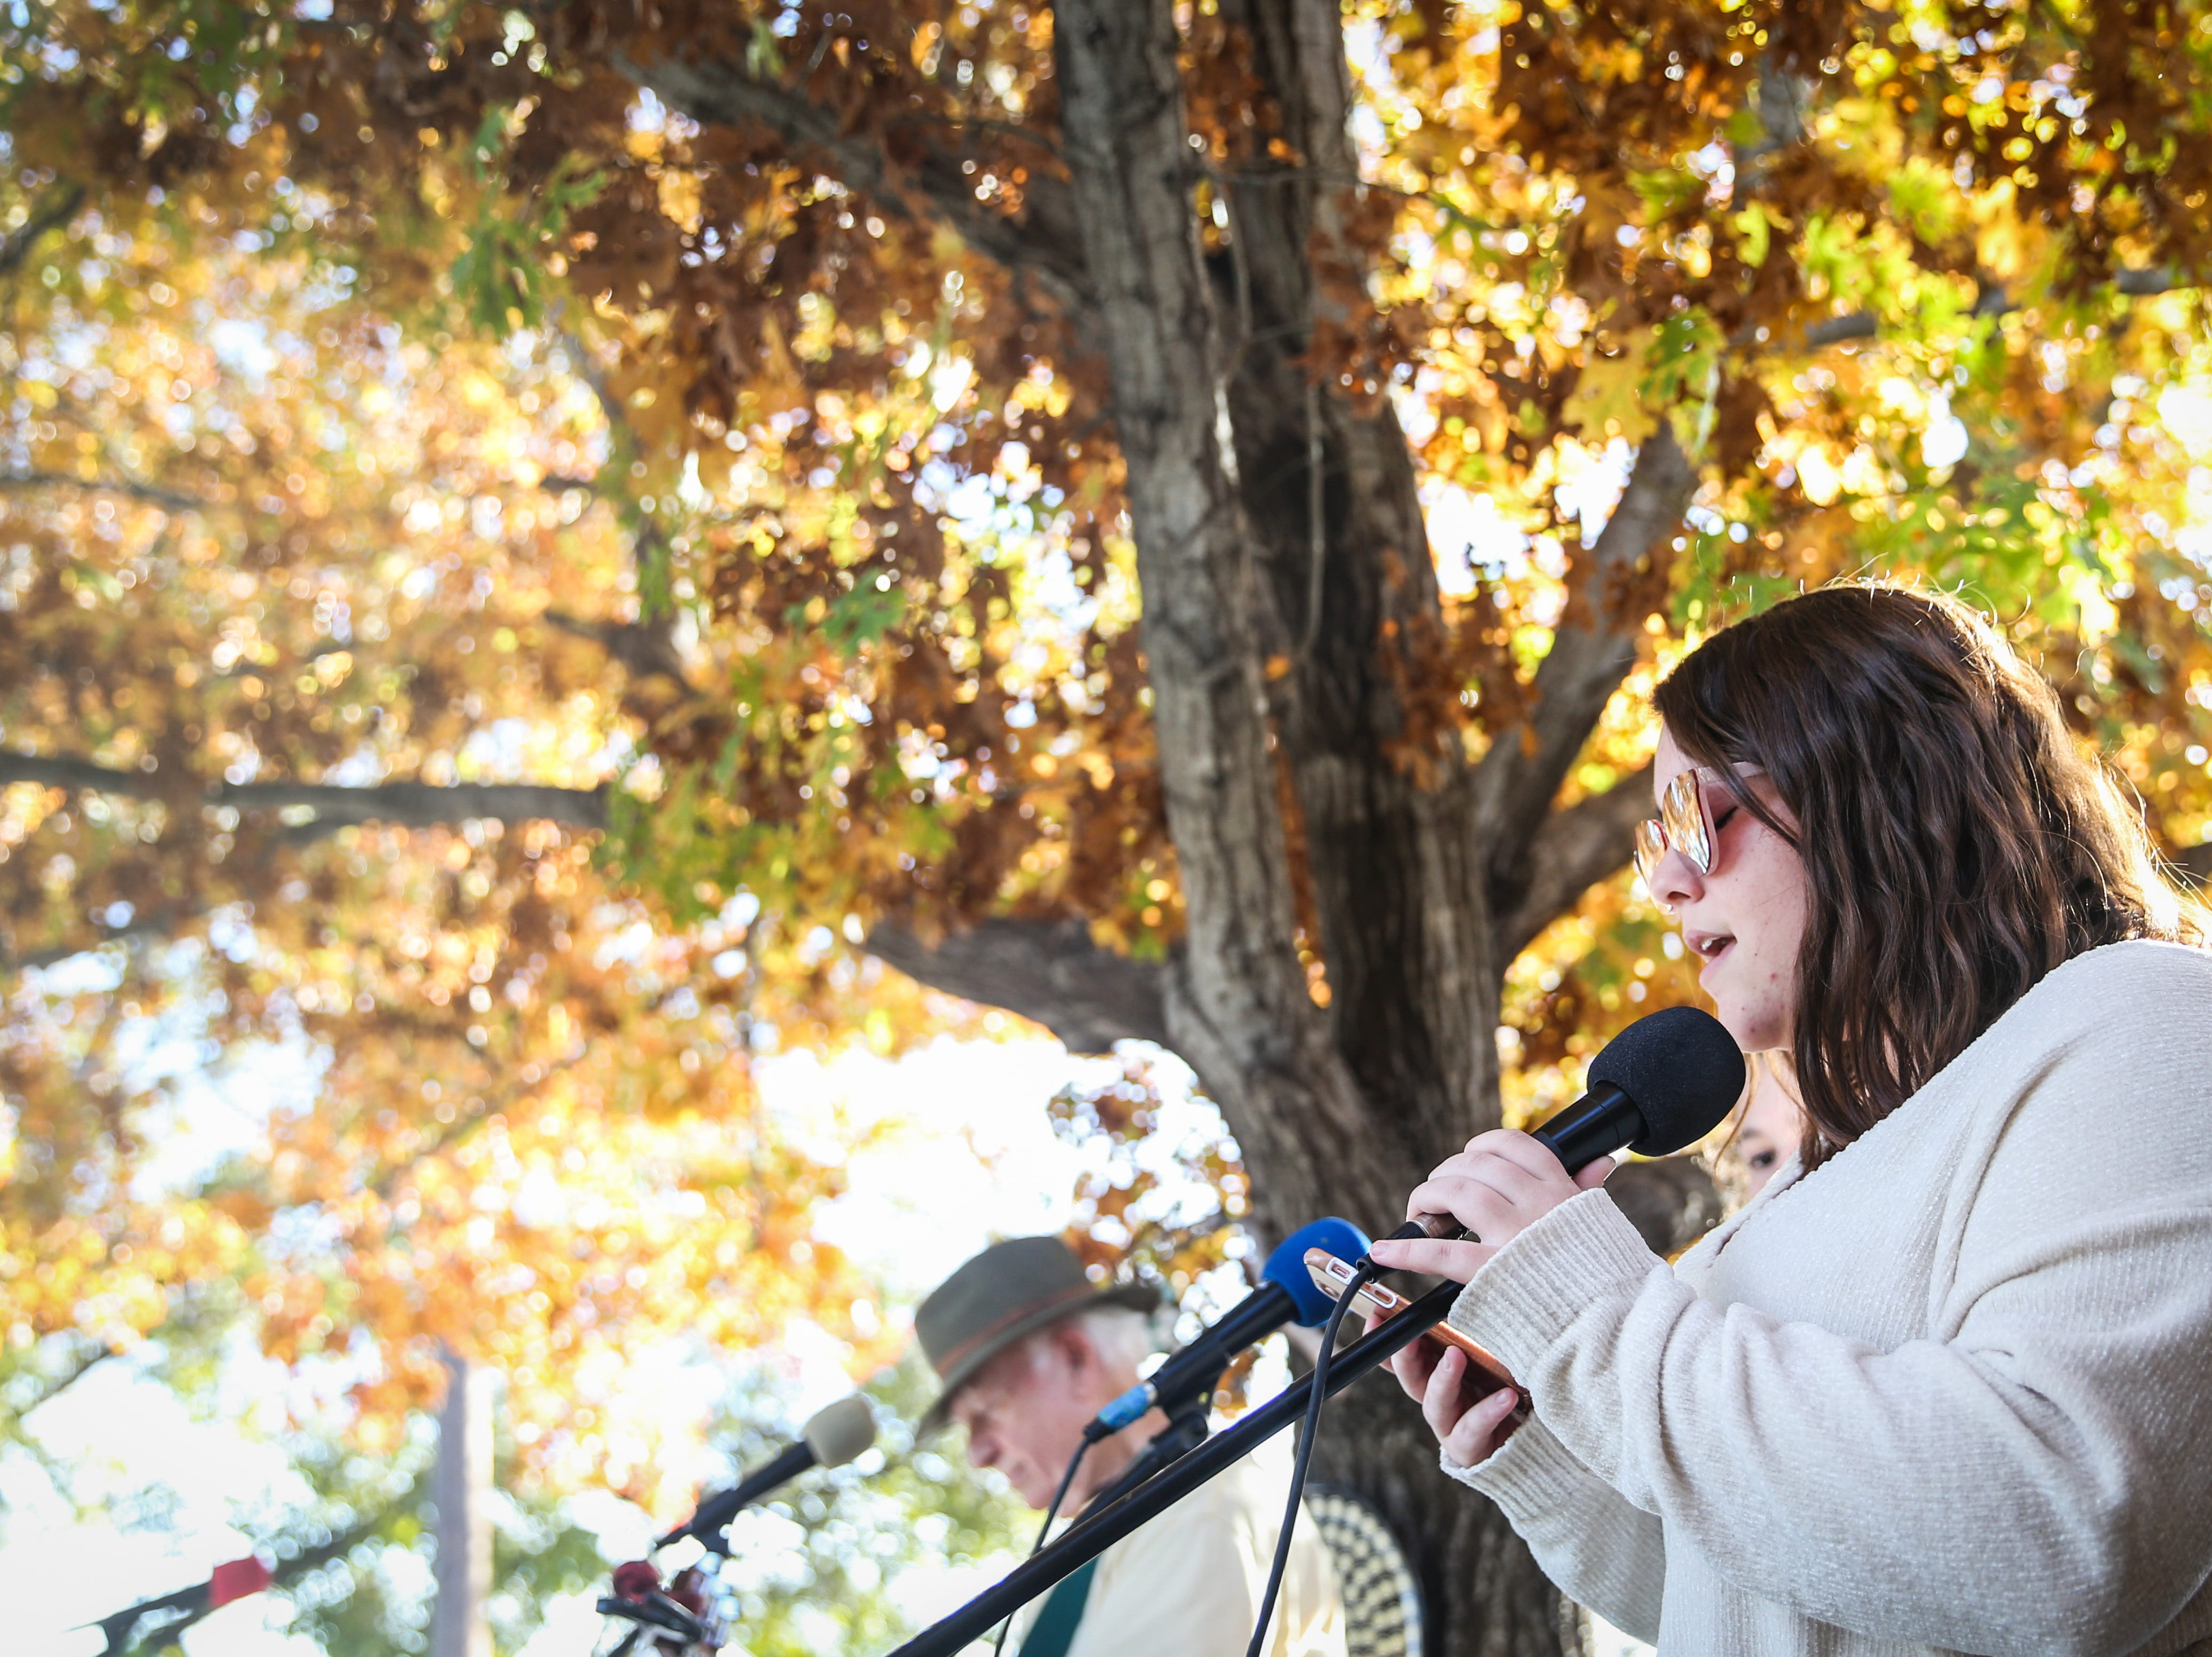 Jordan Maxheimer sings in the courtyard during the Thanksgiving Open House Friday, Nov. 23, 2018, at the Chicken Farm Art Center.